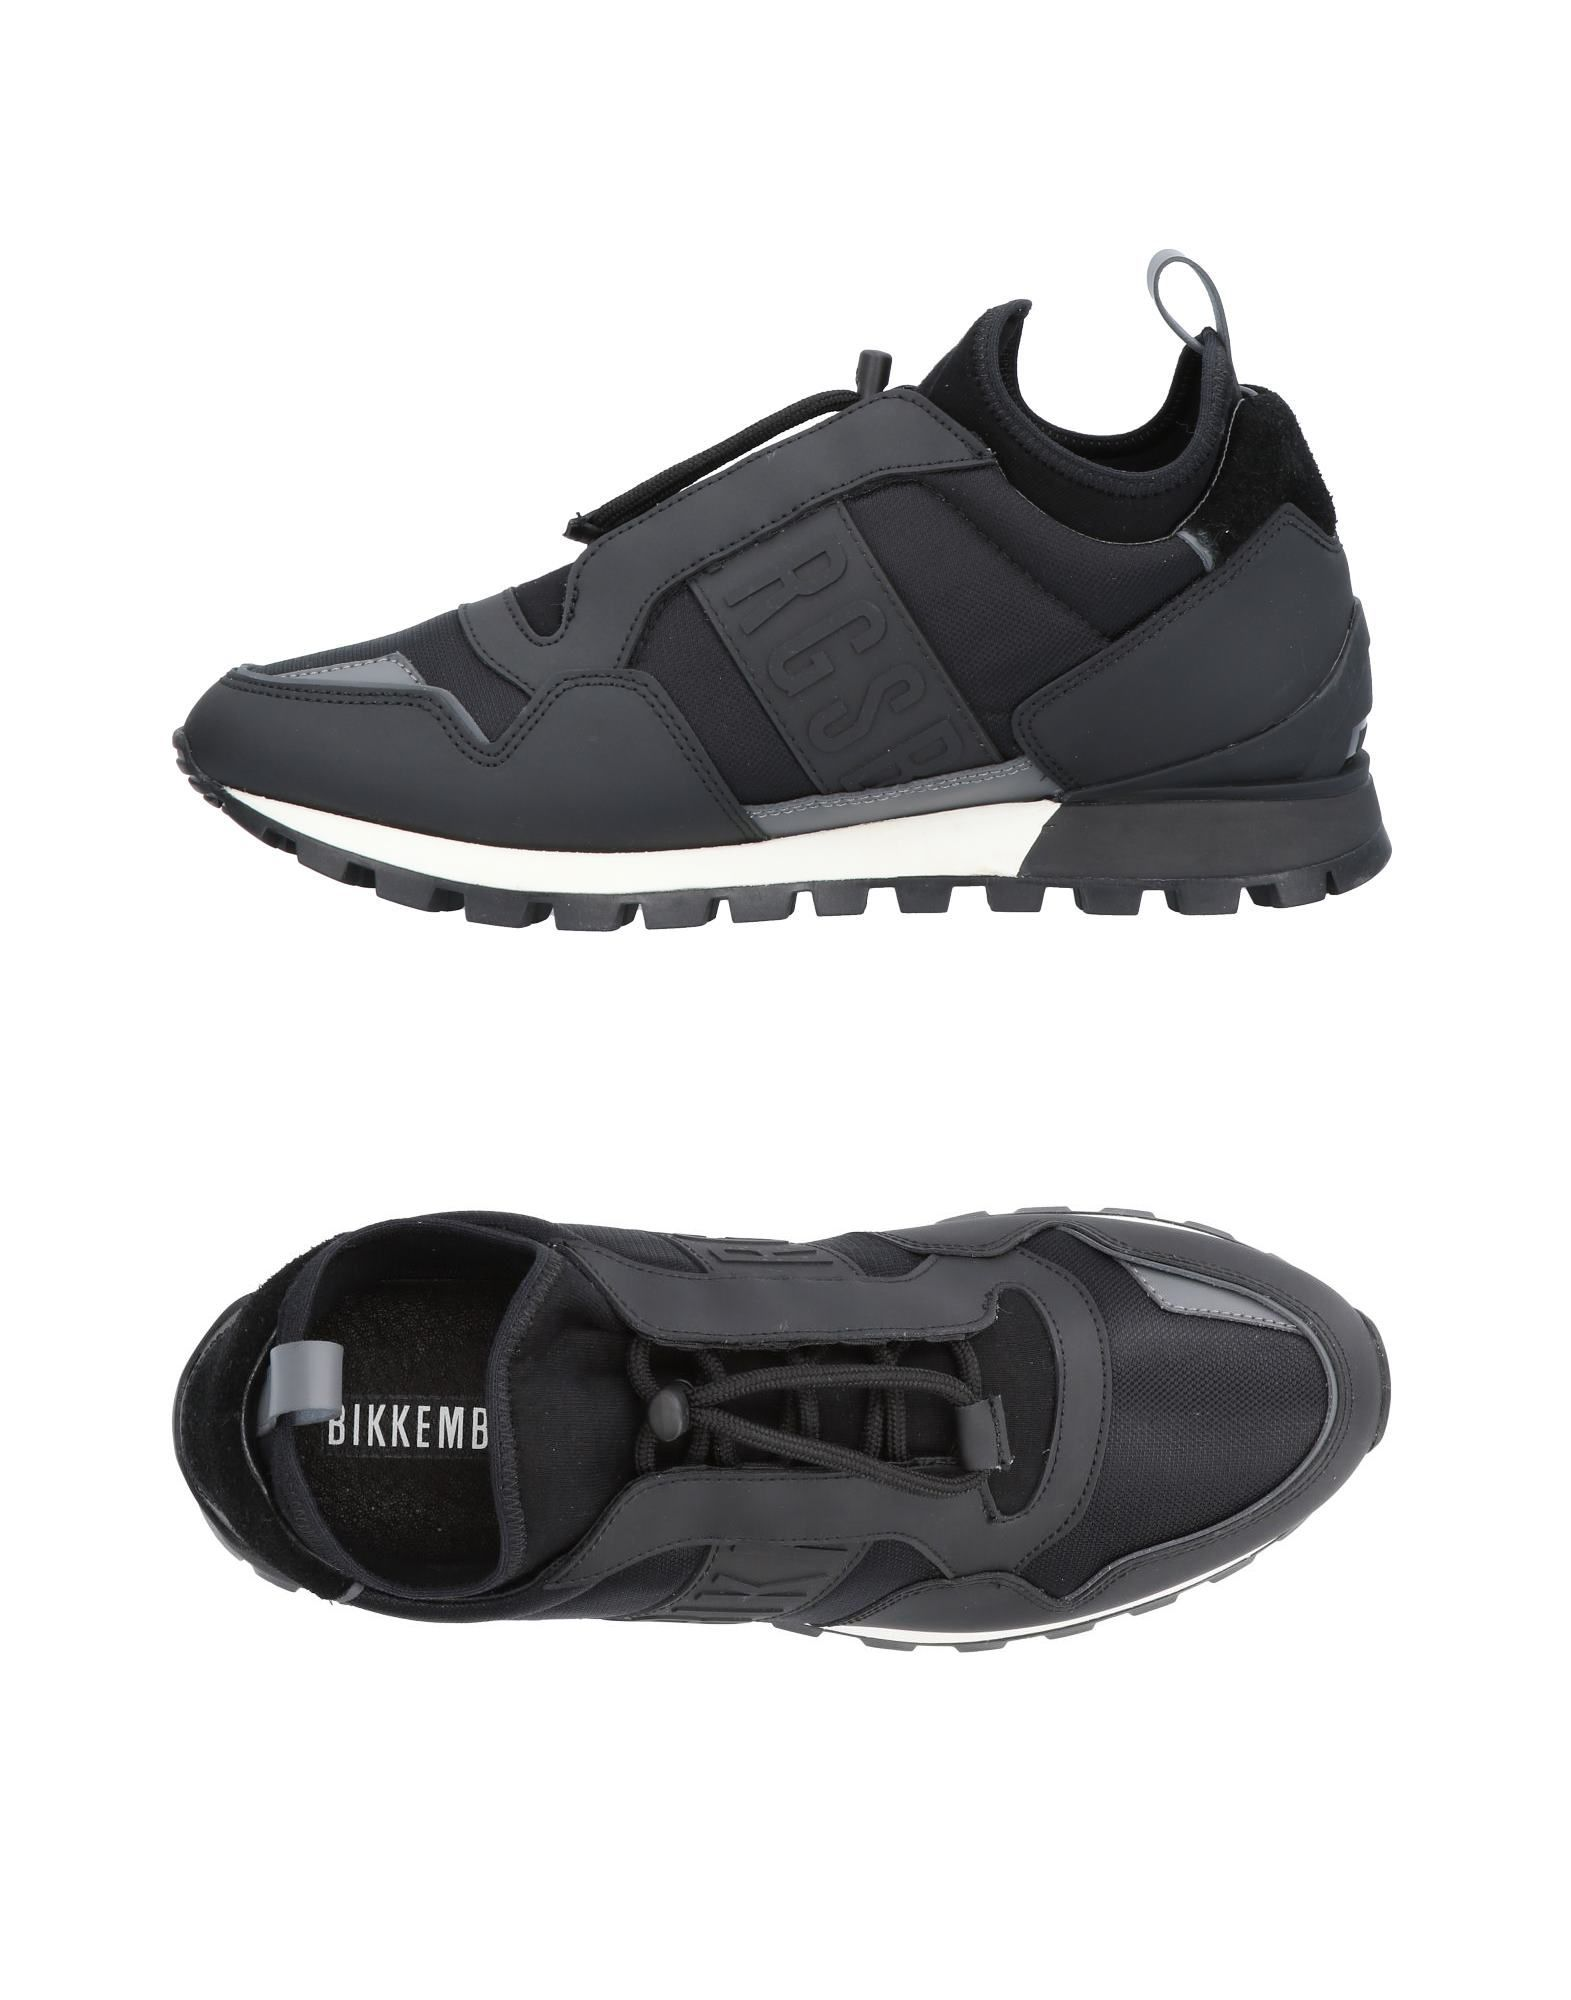 Bikkembergs Sneakers Sneakers Bikkembergs Herren  11449949DK Heiße Schuhe 406842